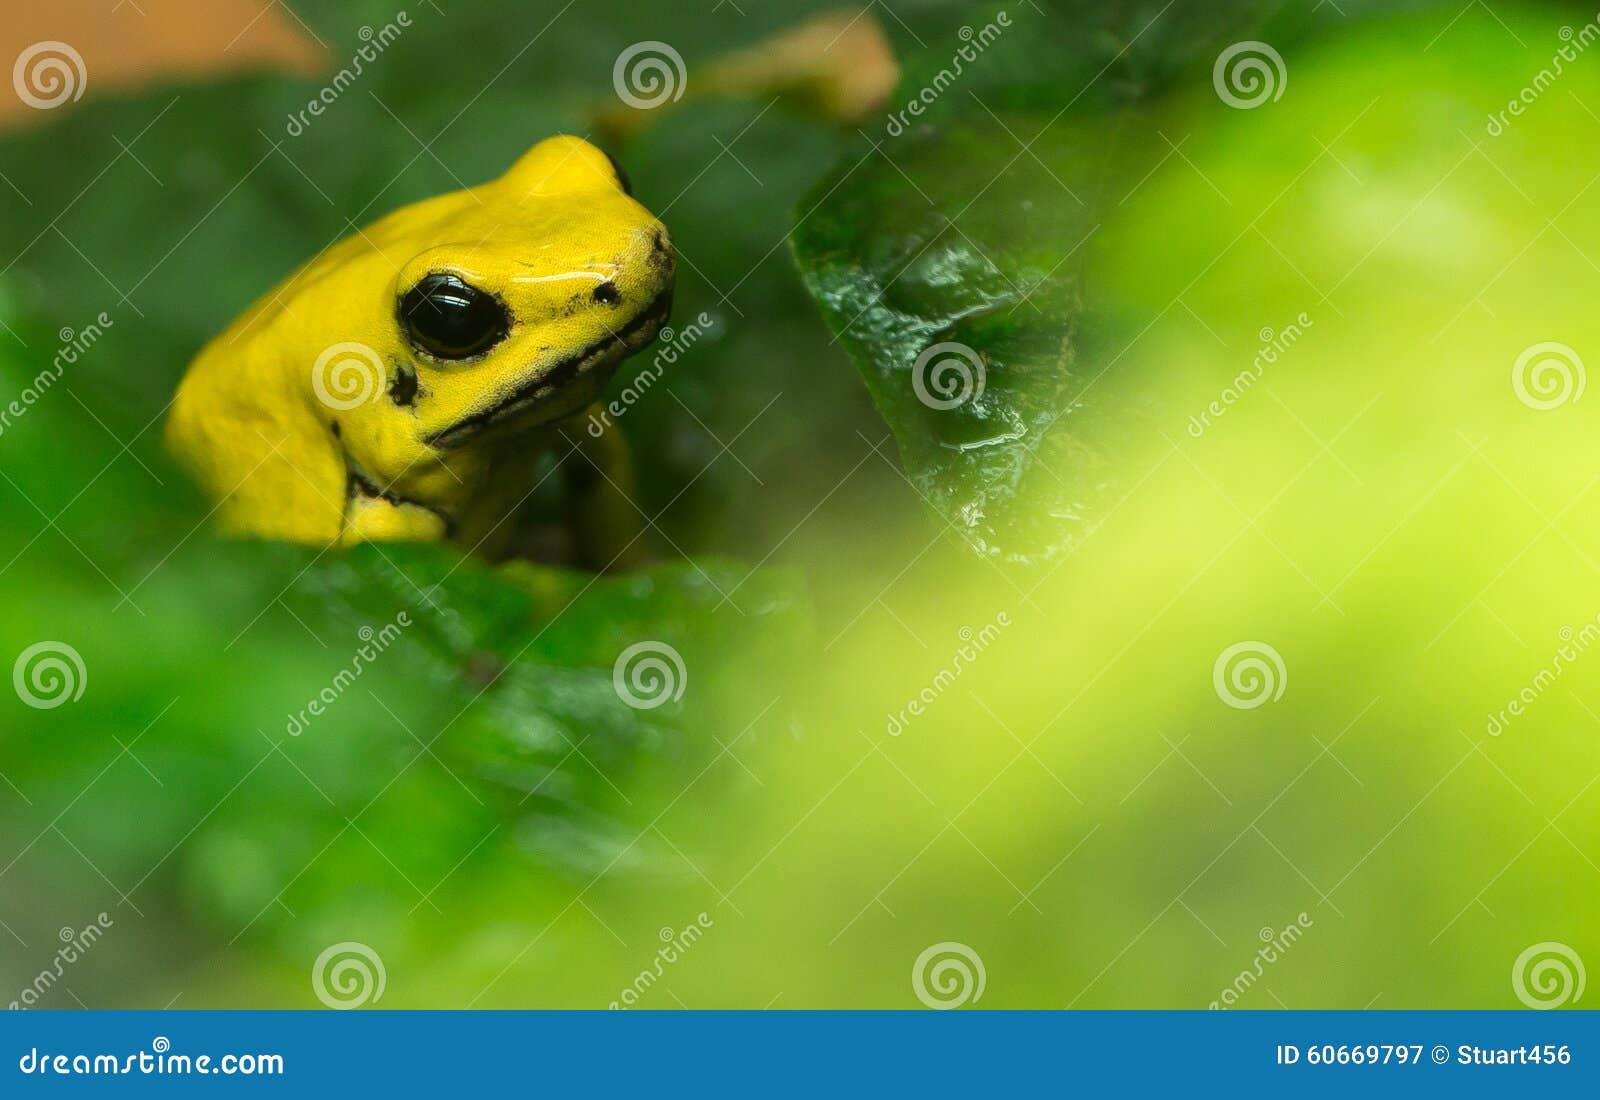 Golden Poison Frog (Phyllobates terribilis), National Zoo, Washington DC.